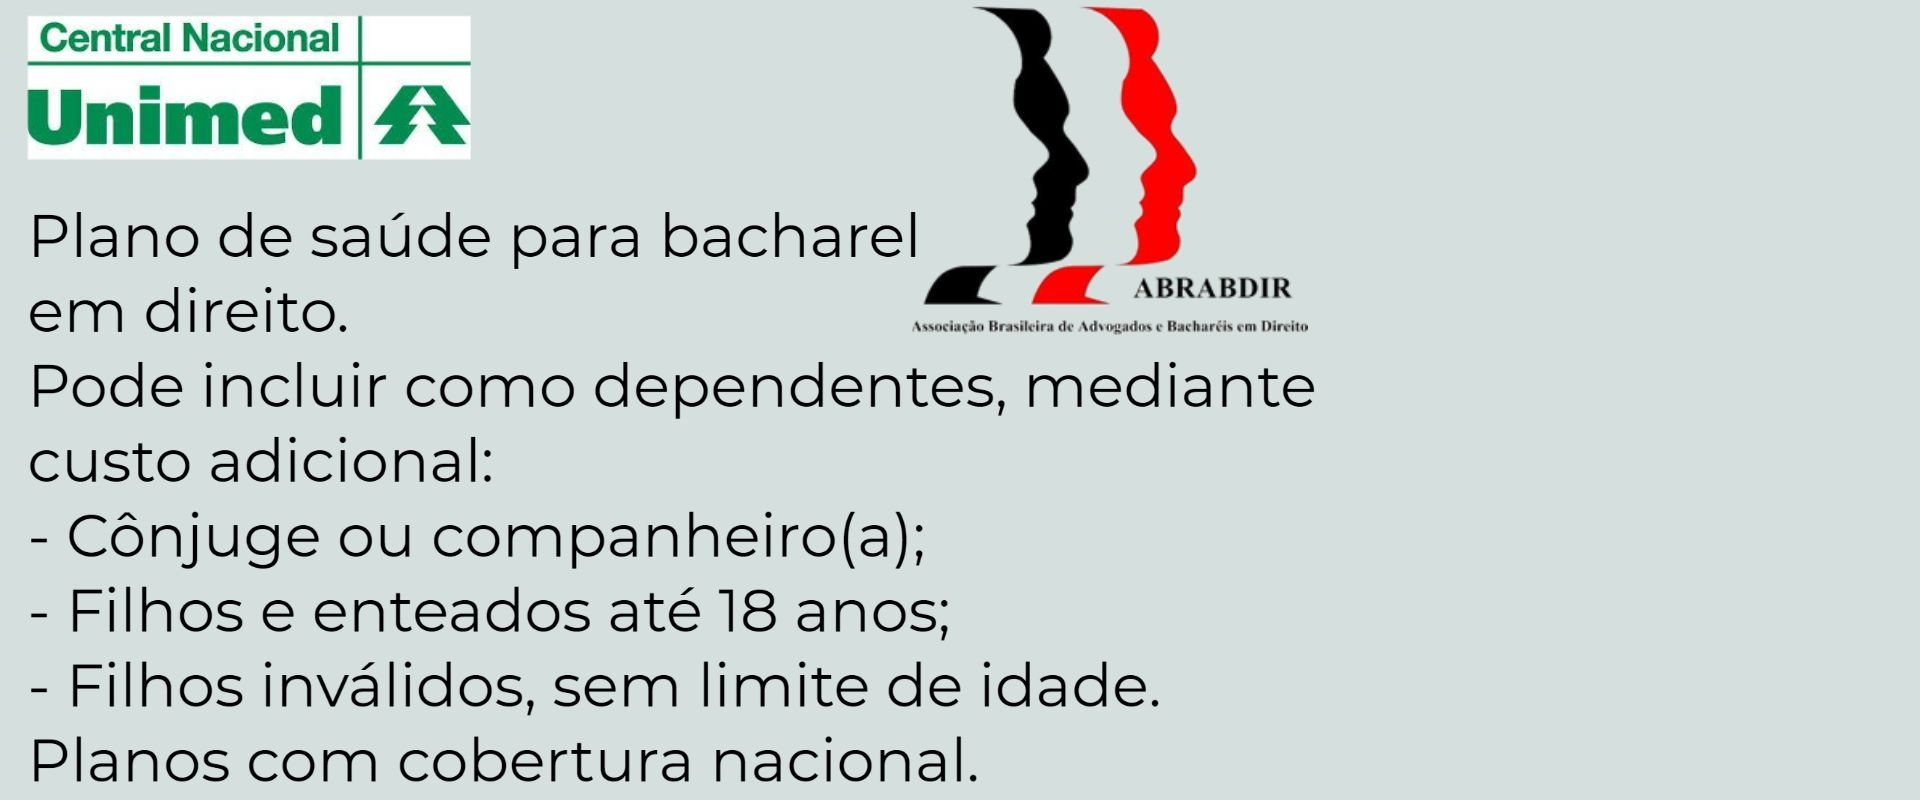 Unimed ABRABDIR Mirassol